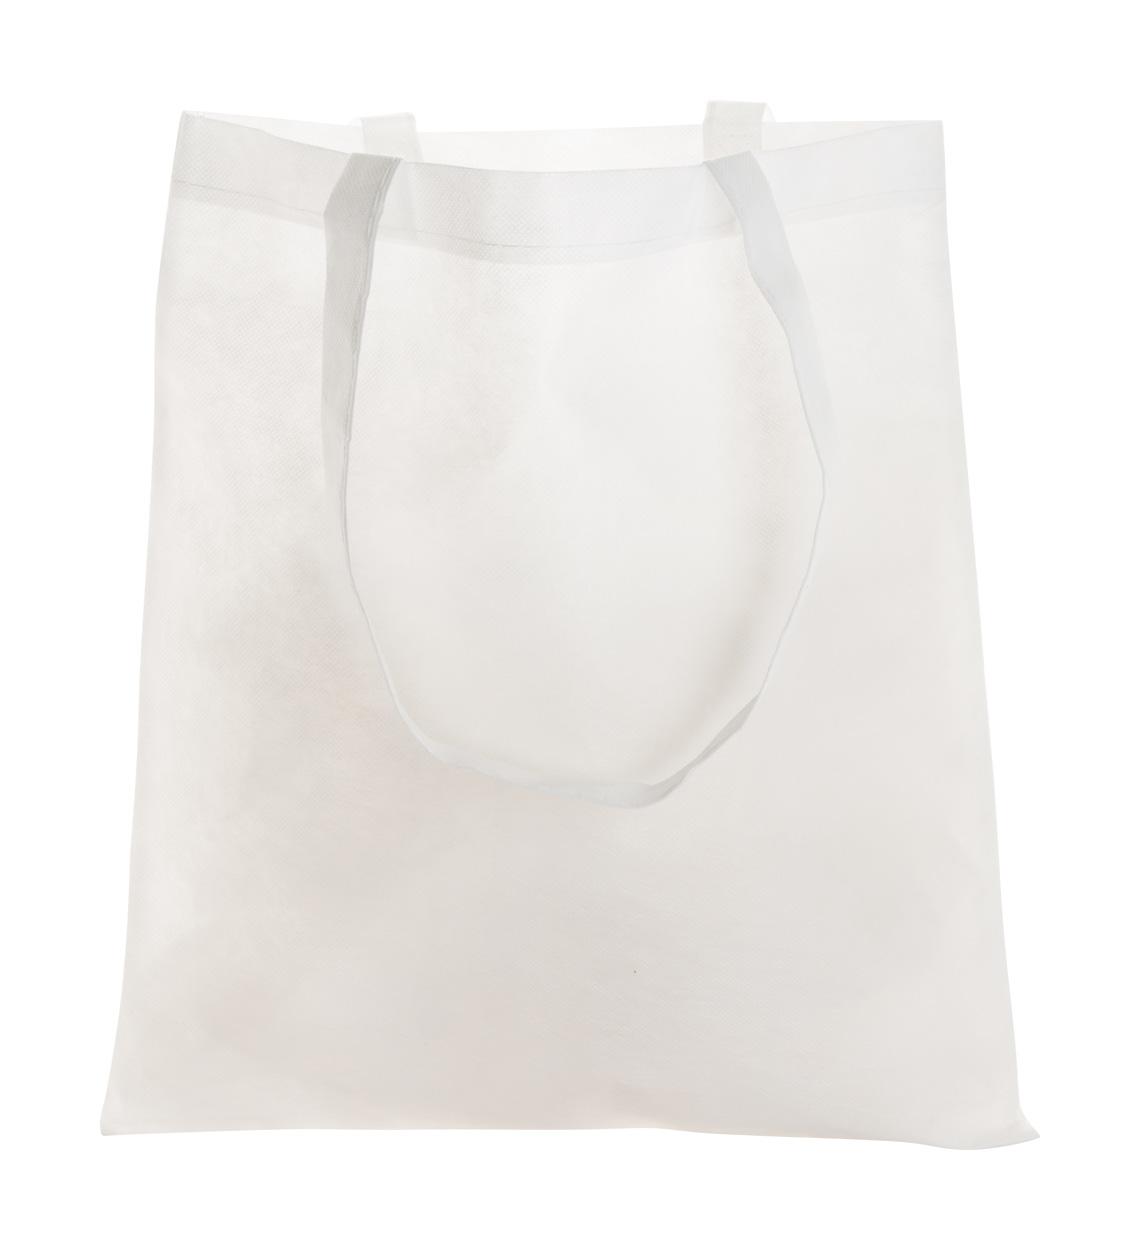 Mirtal shopping bag